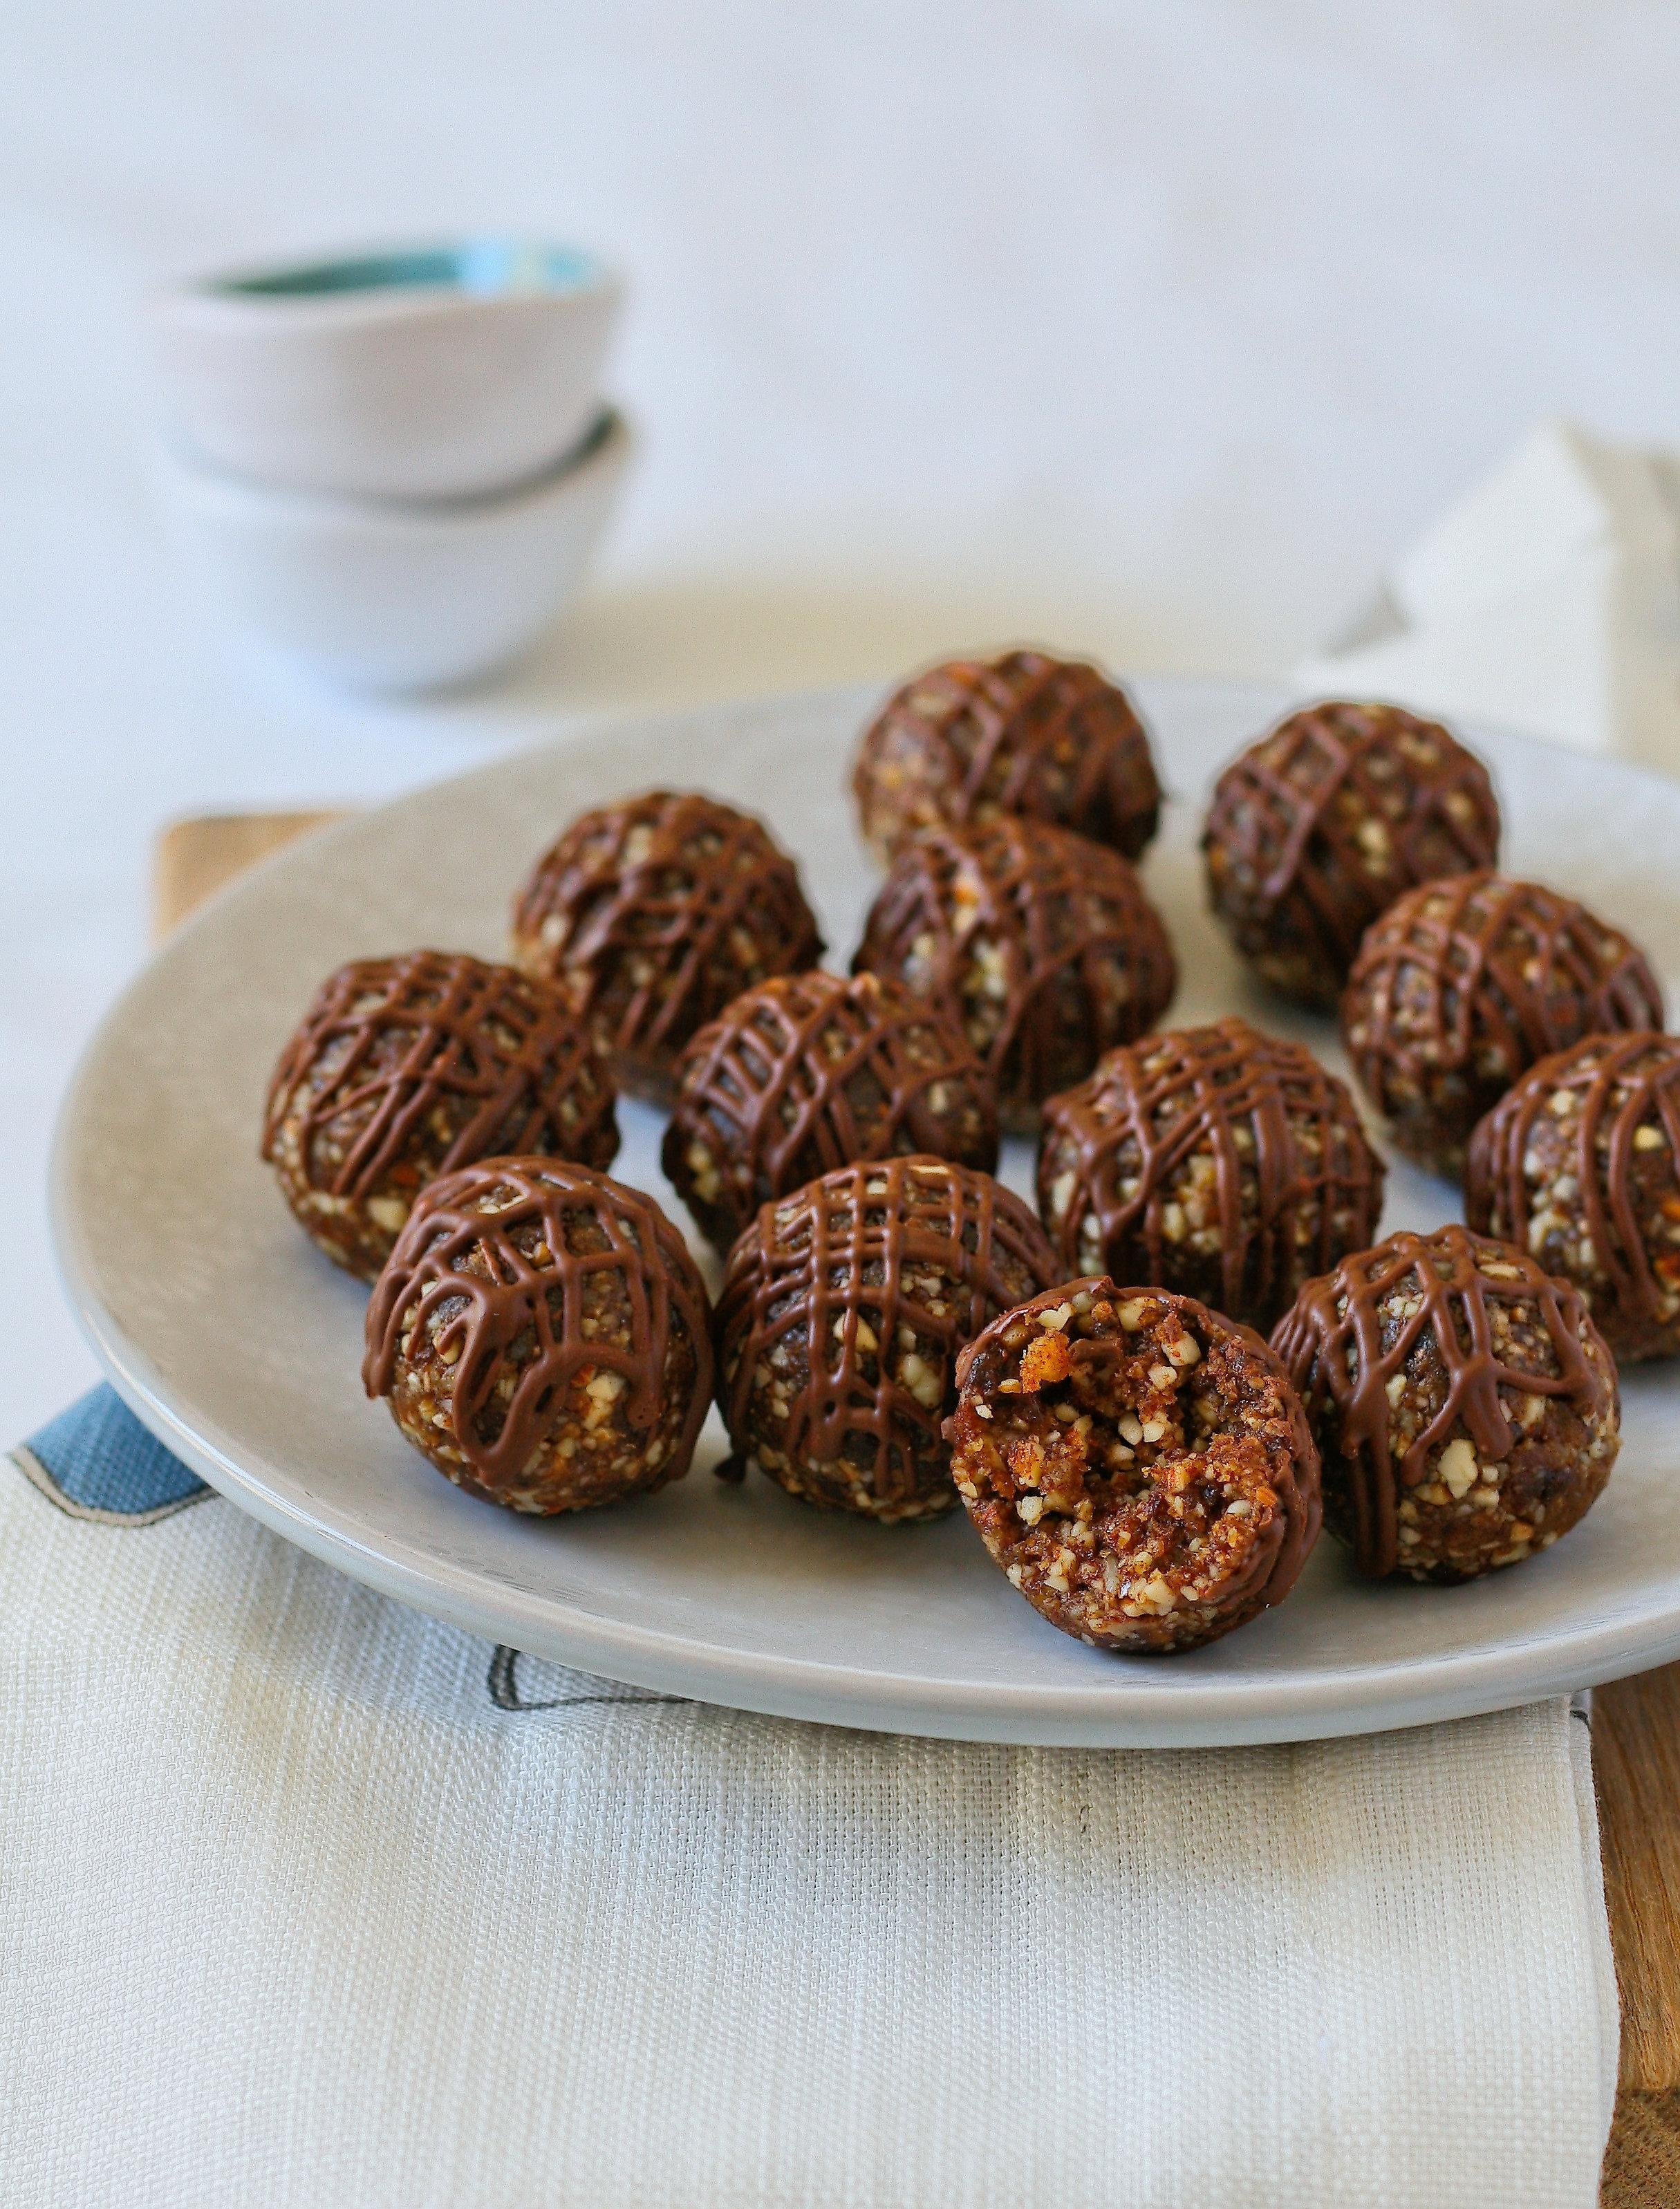 Date balls with dark chocolate